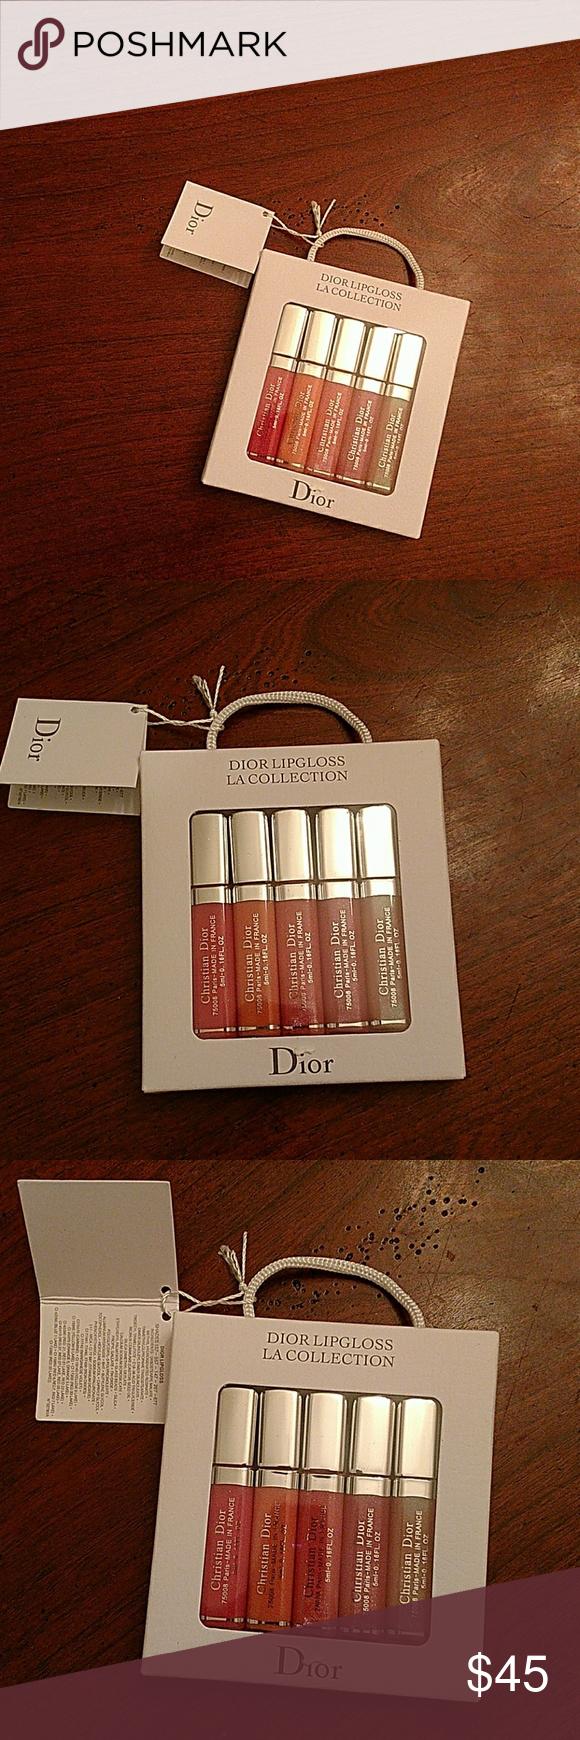 Dior lipgloss la collection Paris- France set of 5 Dior la collection lipgloss Smollet size.5ml-0.16FL.oz Dior Makeup Lipstick